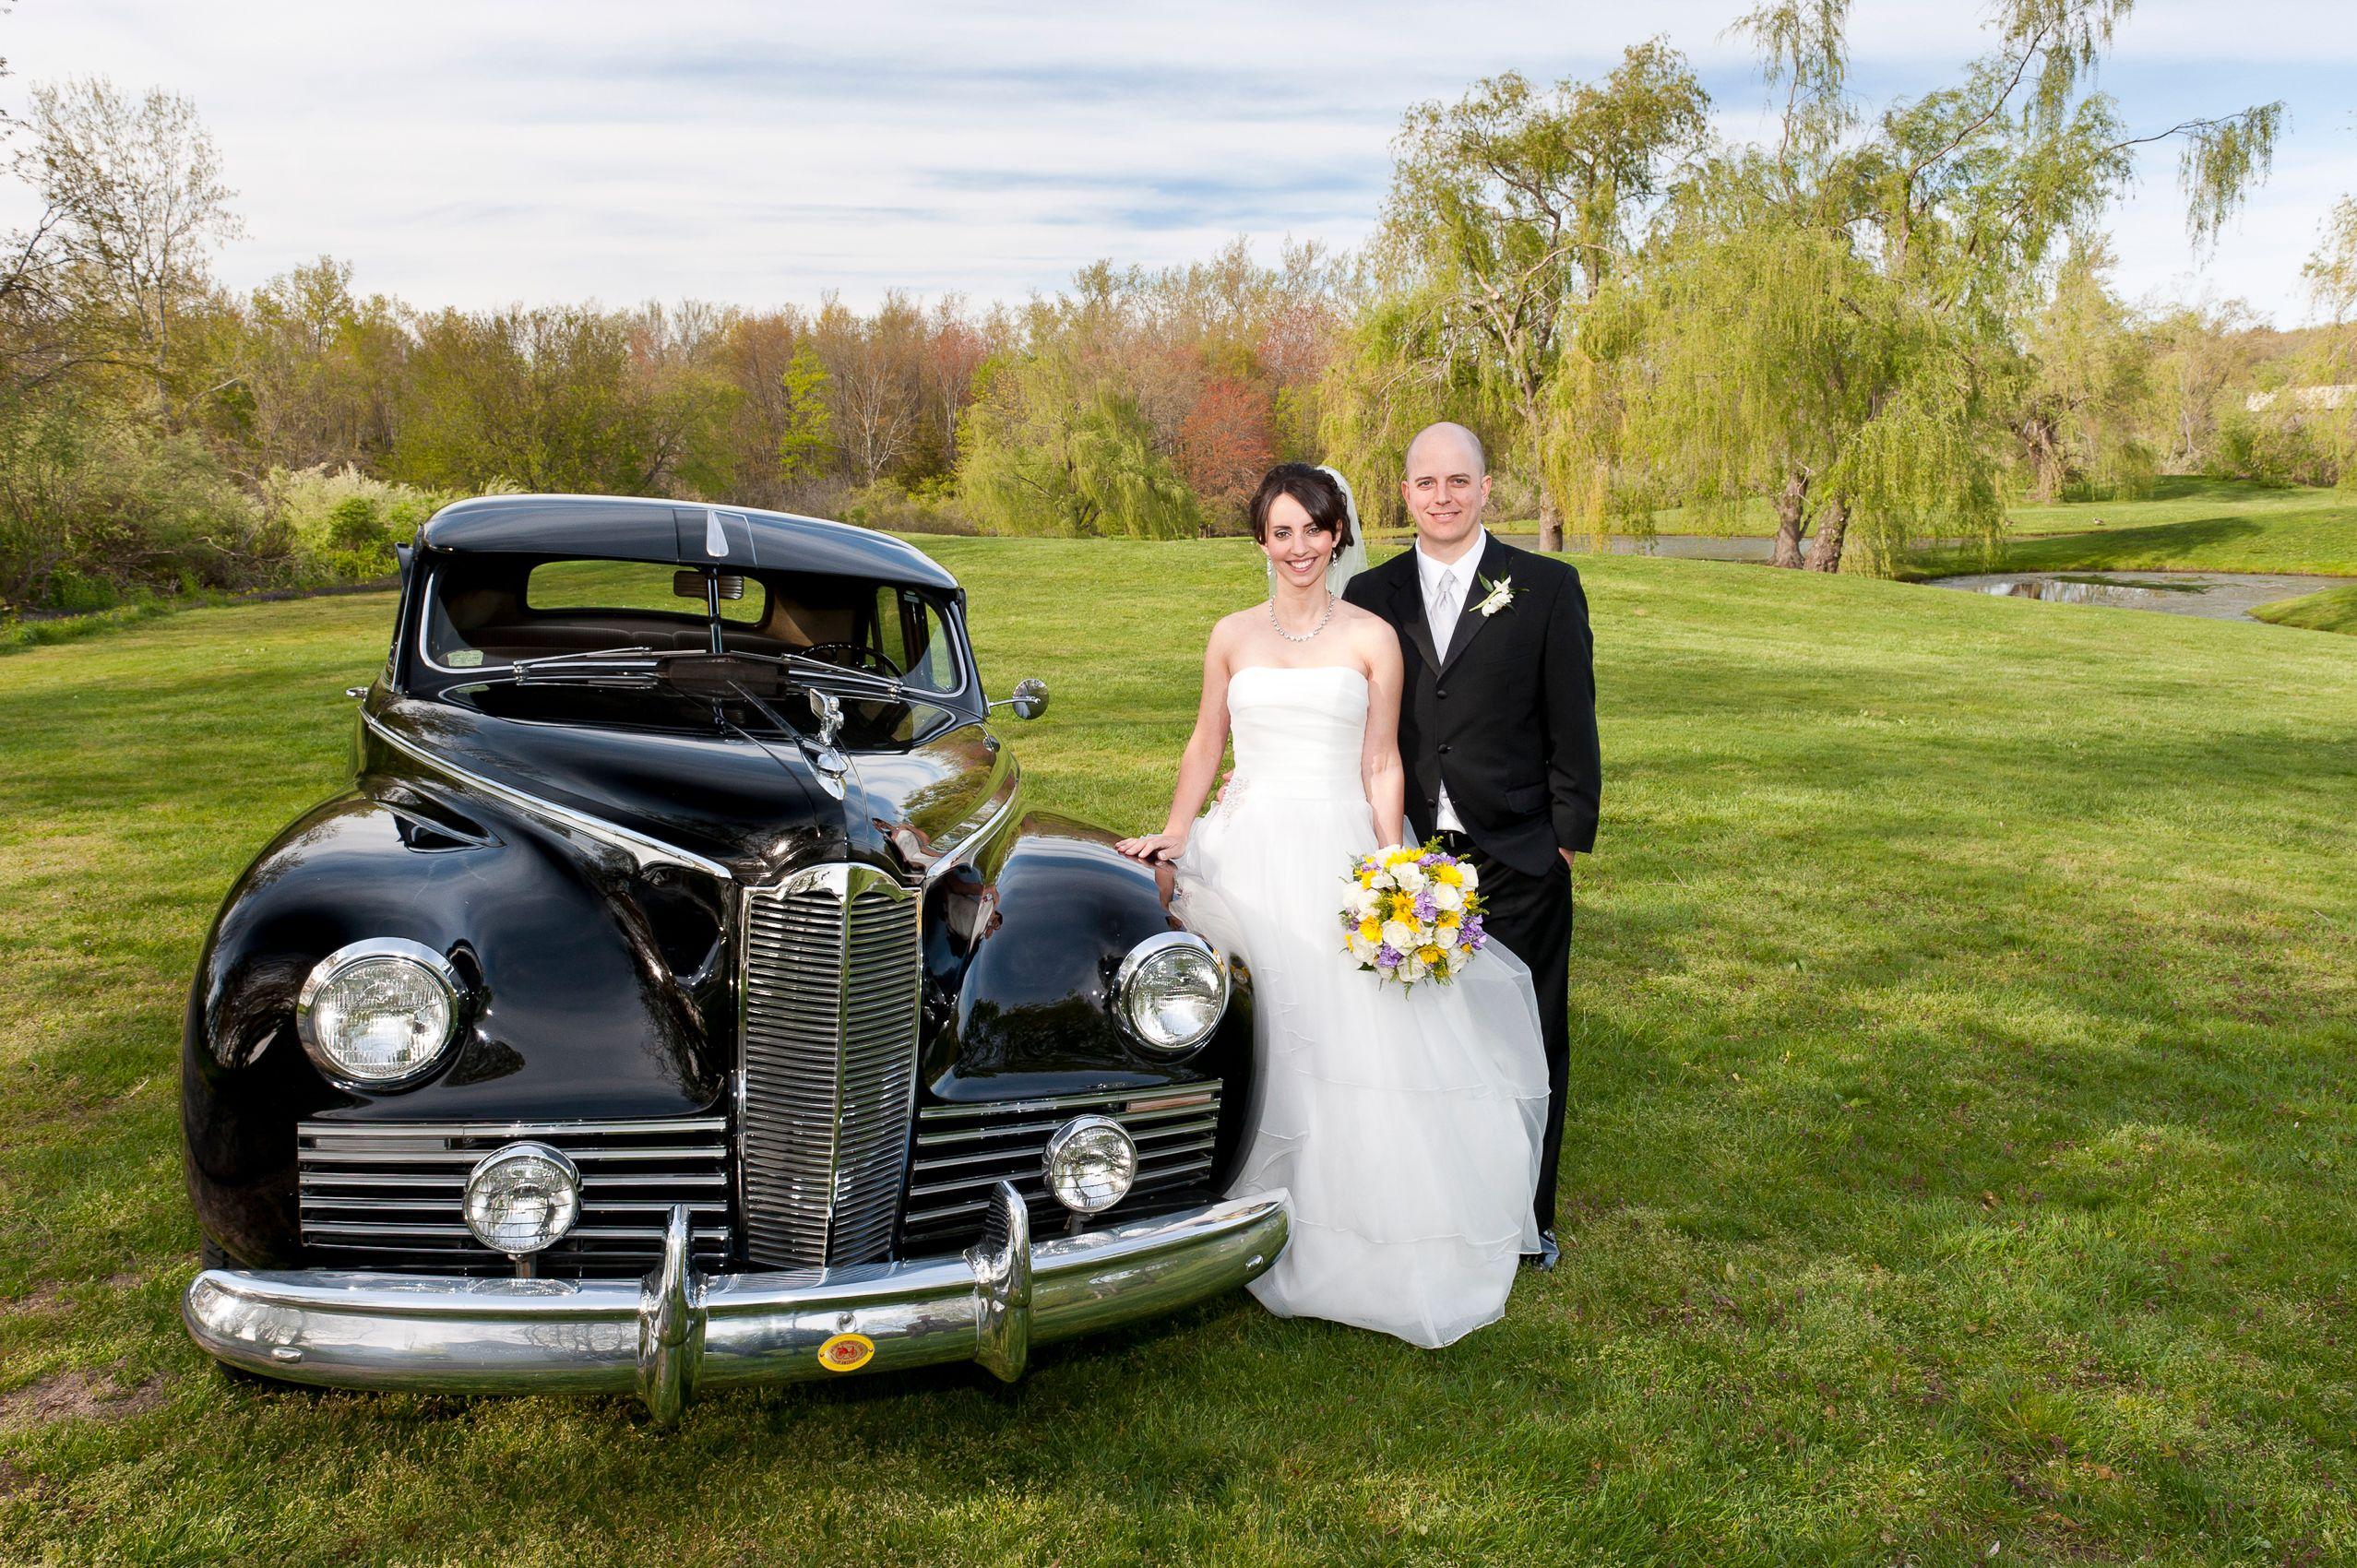 West_Hartford_Connecticut_Wedding_Photography-113.jpg